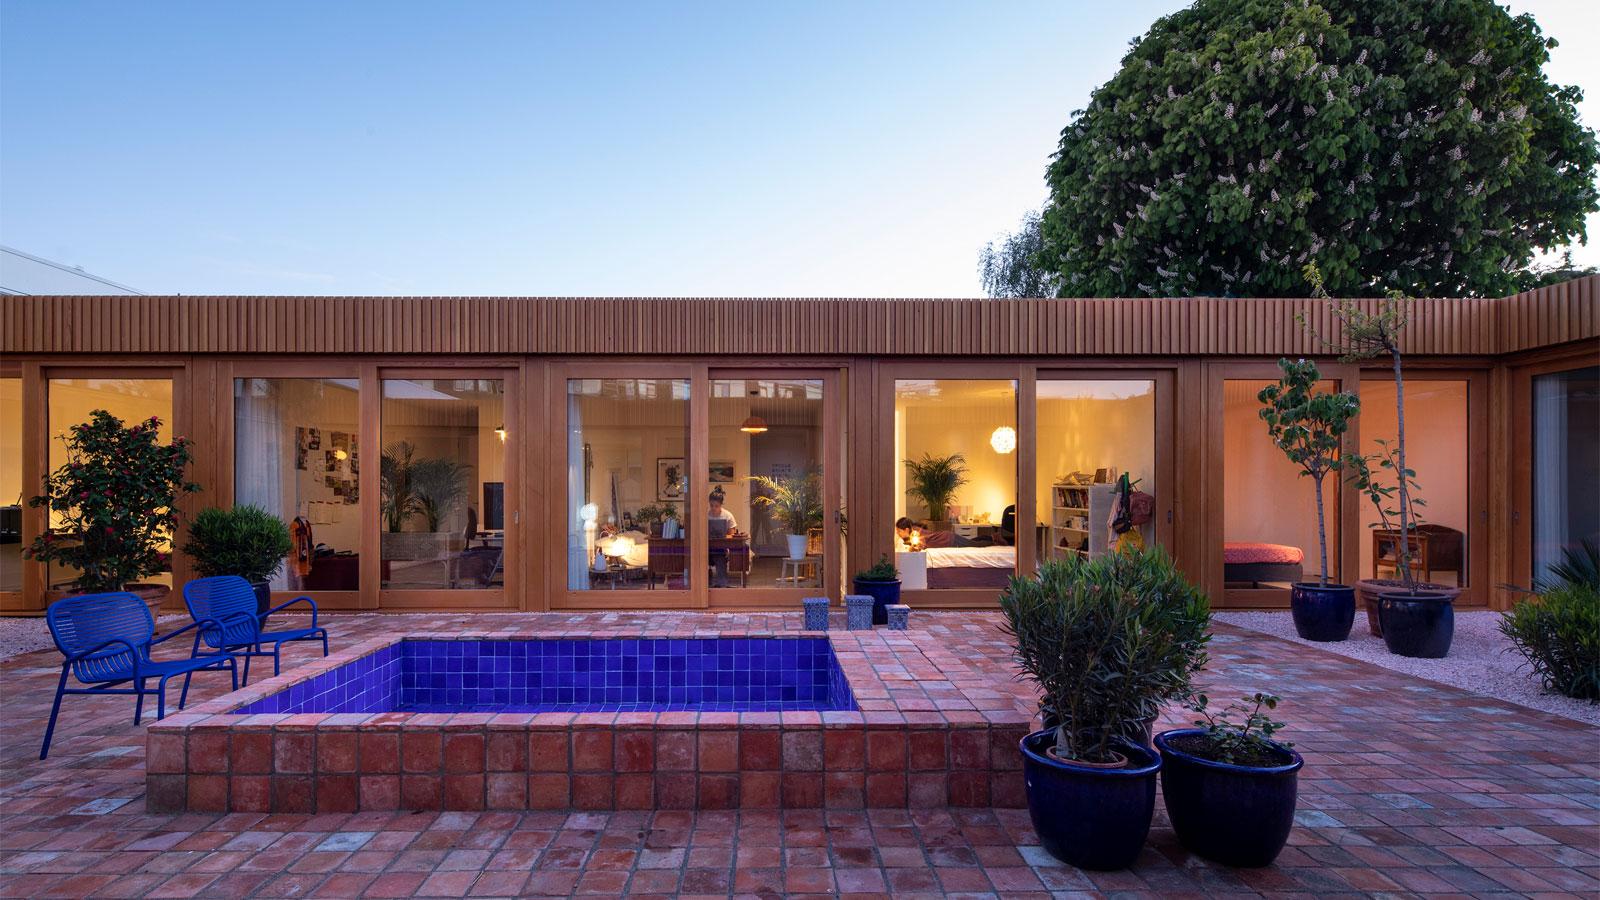 Villa Stardust, courtyard - night time: Moroccan riad inspired Villa Stardust by MVRDV